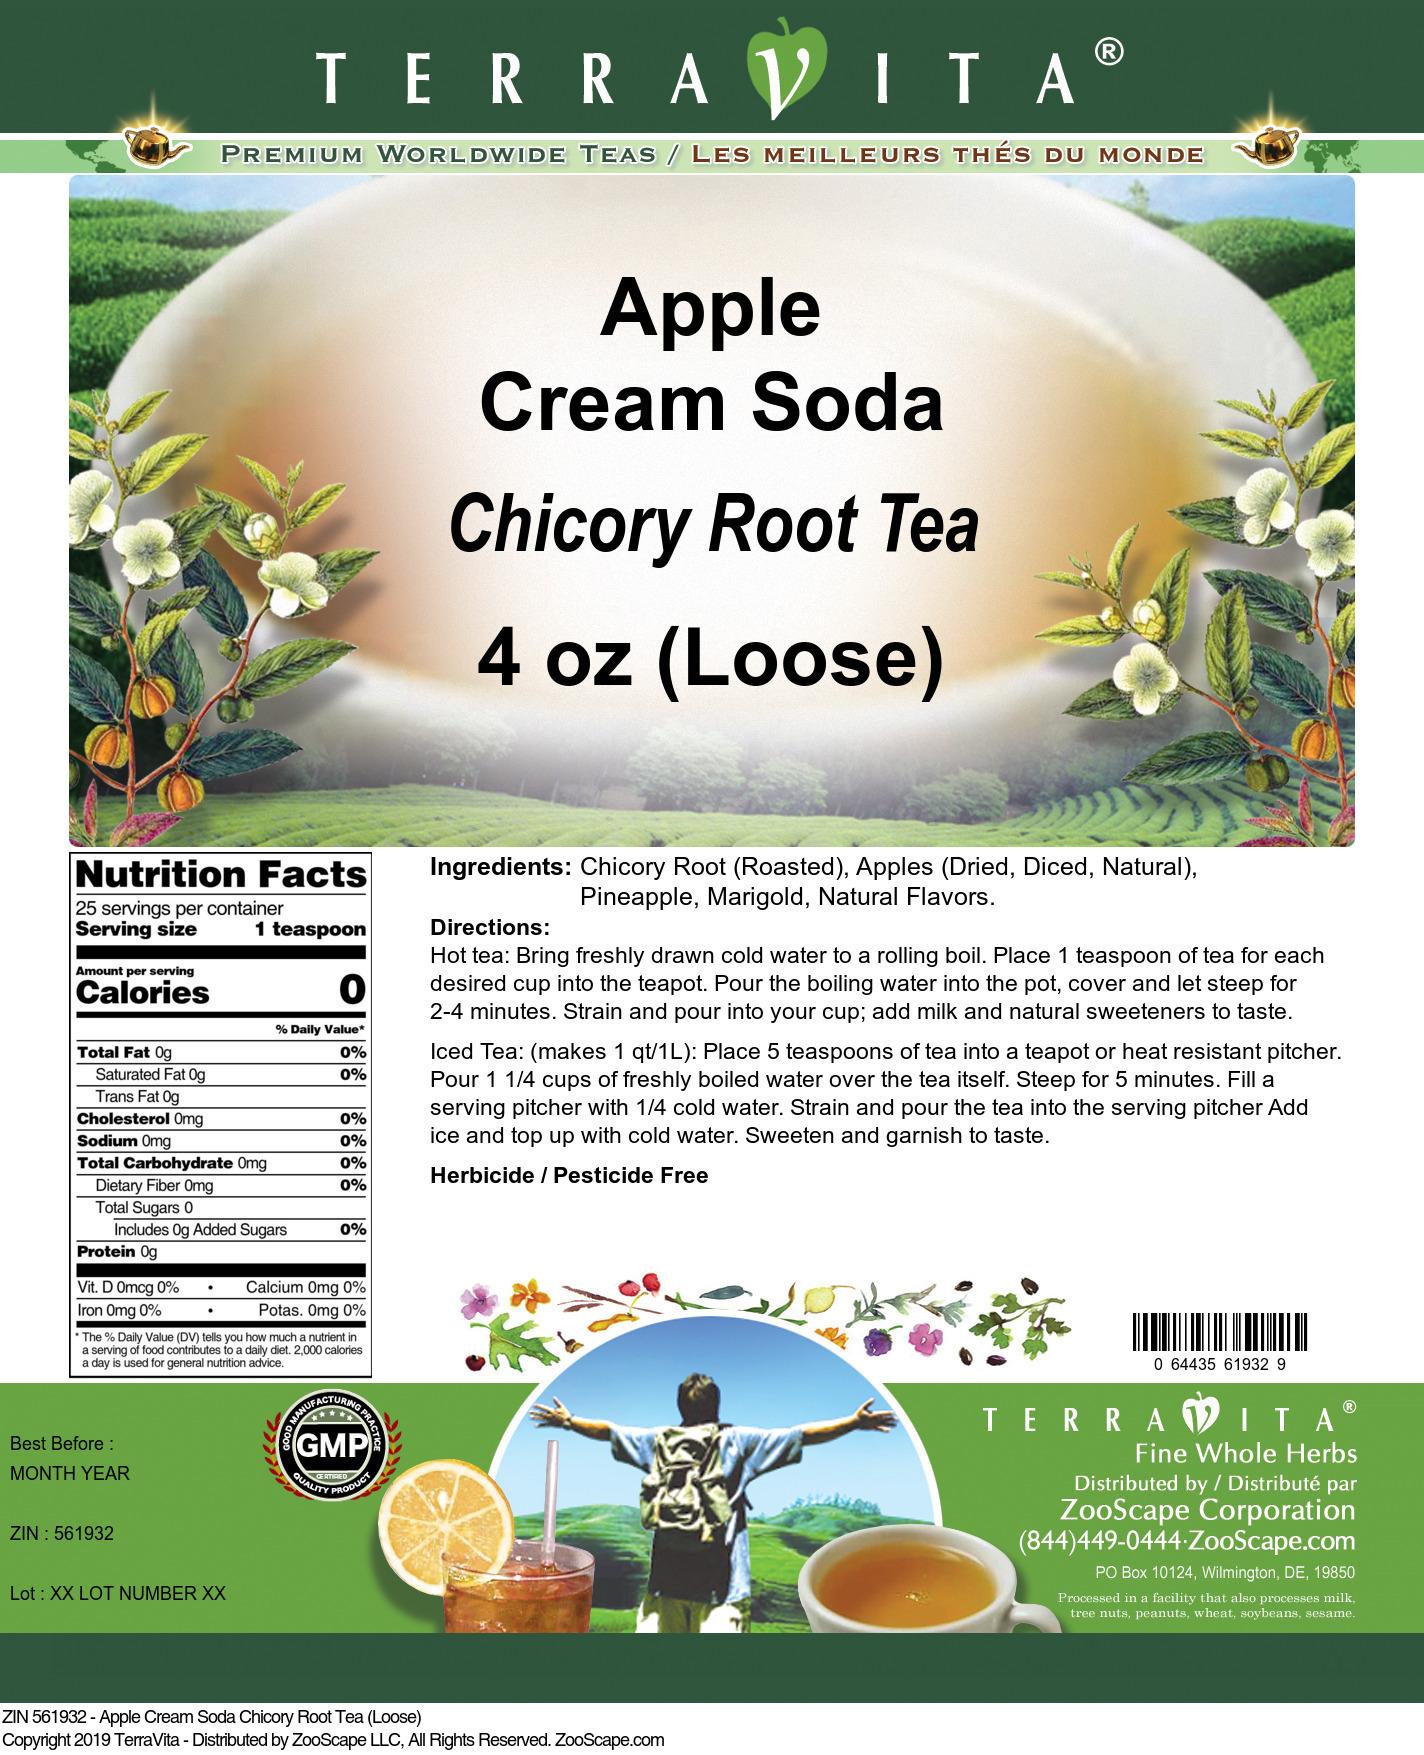 Apple Cream Soda Chicory Root